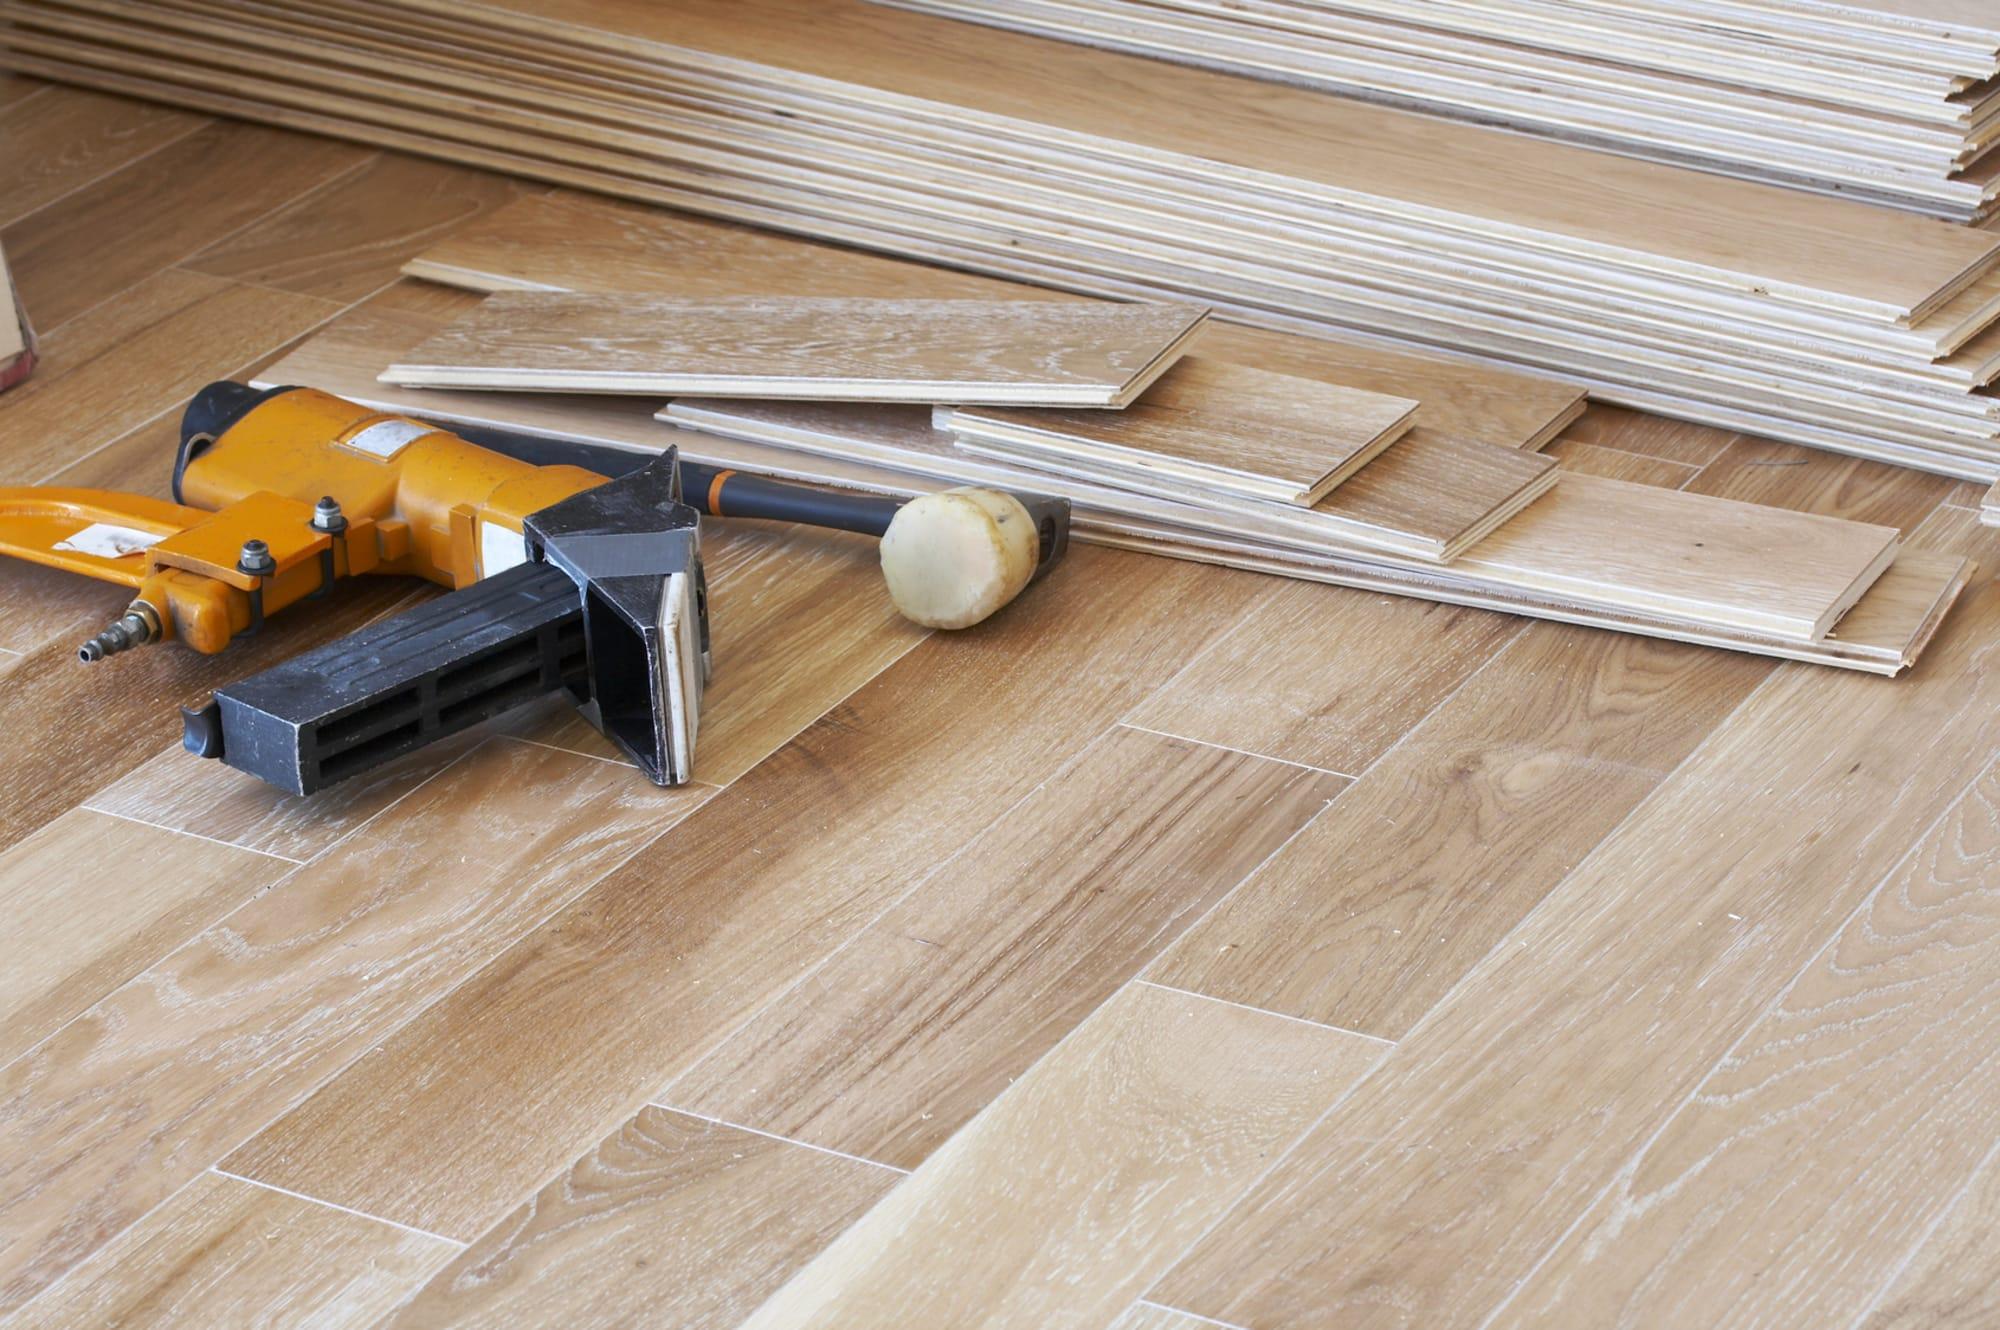 Top 10 Flooring S In Naples Fl, Laminate Flooring Free Installation